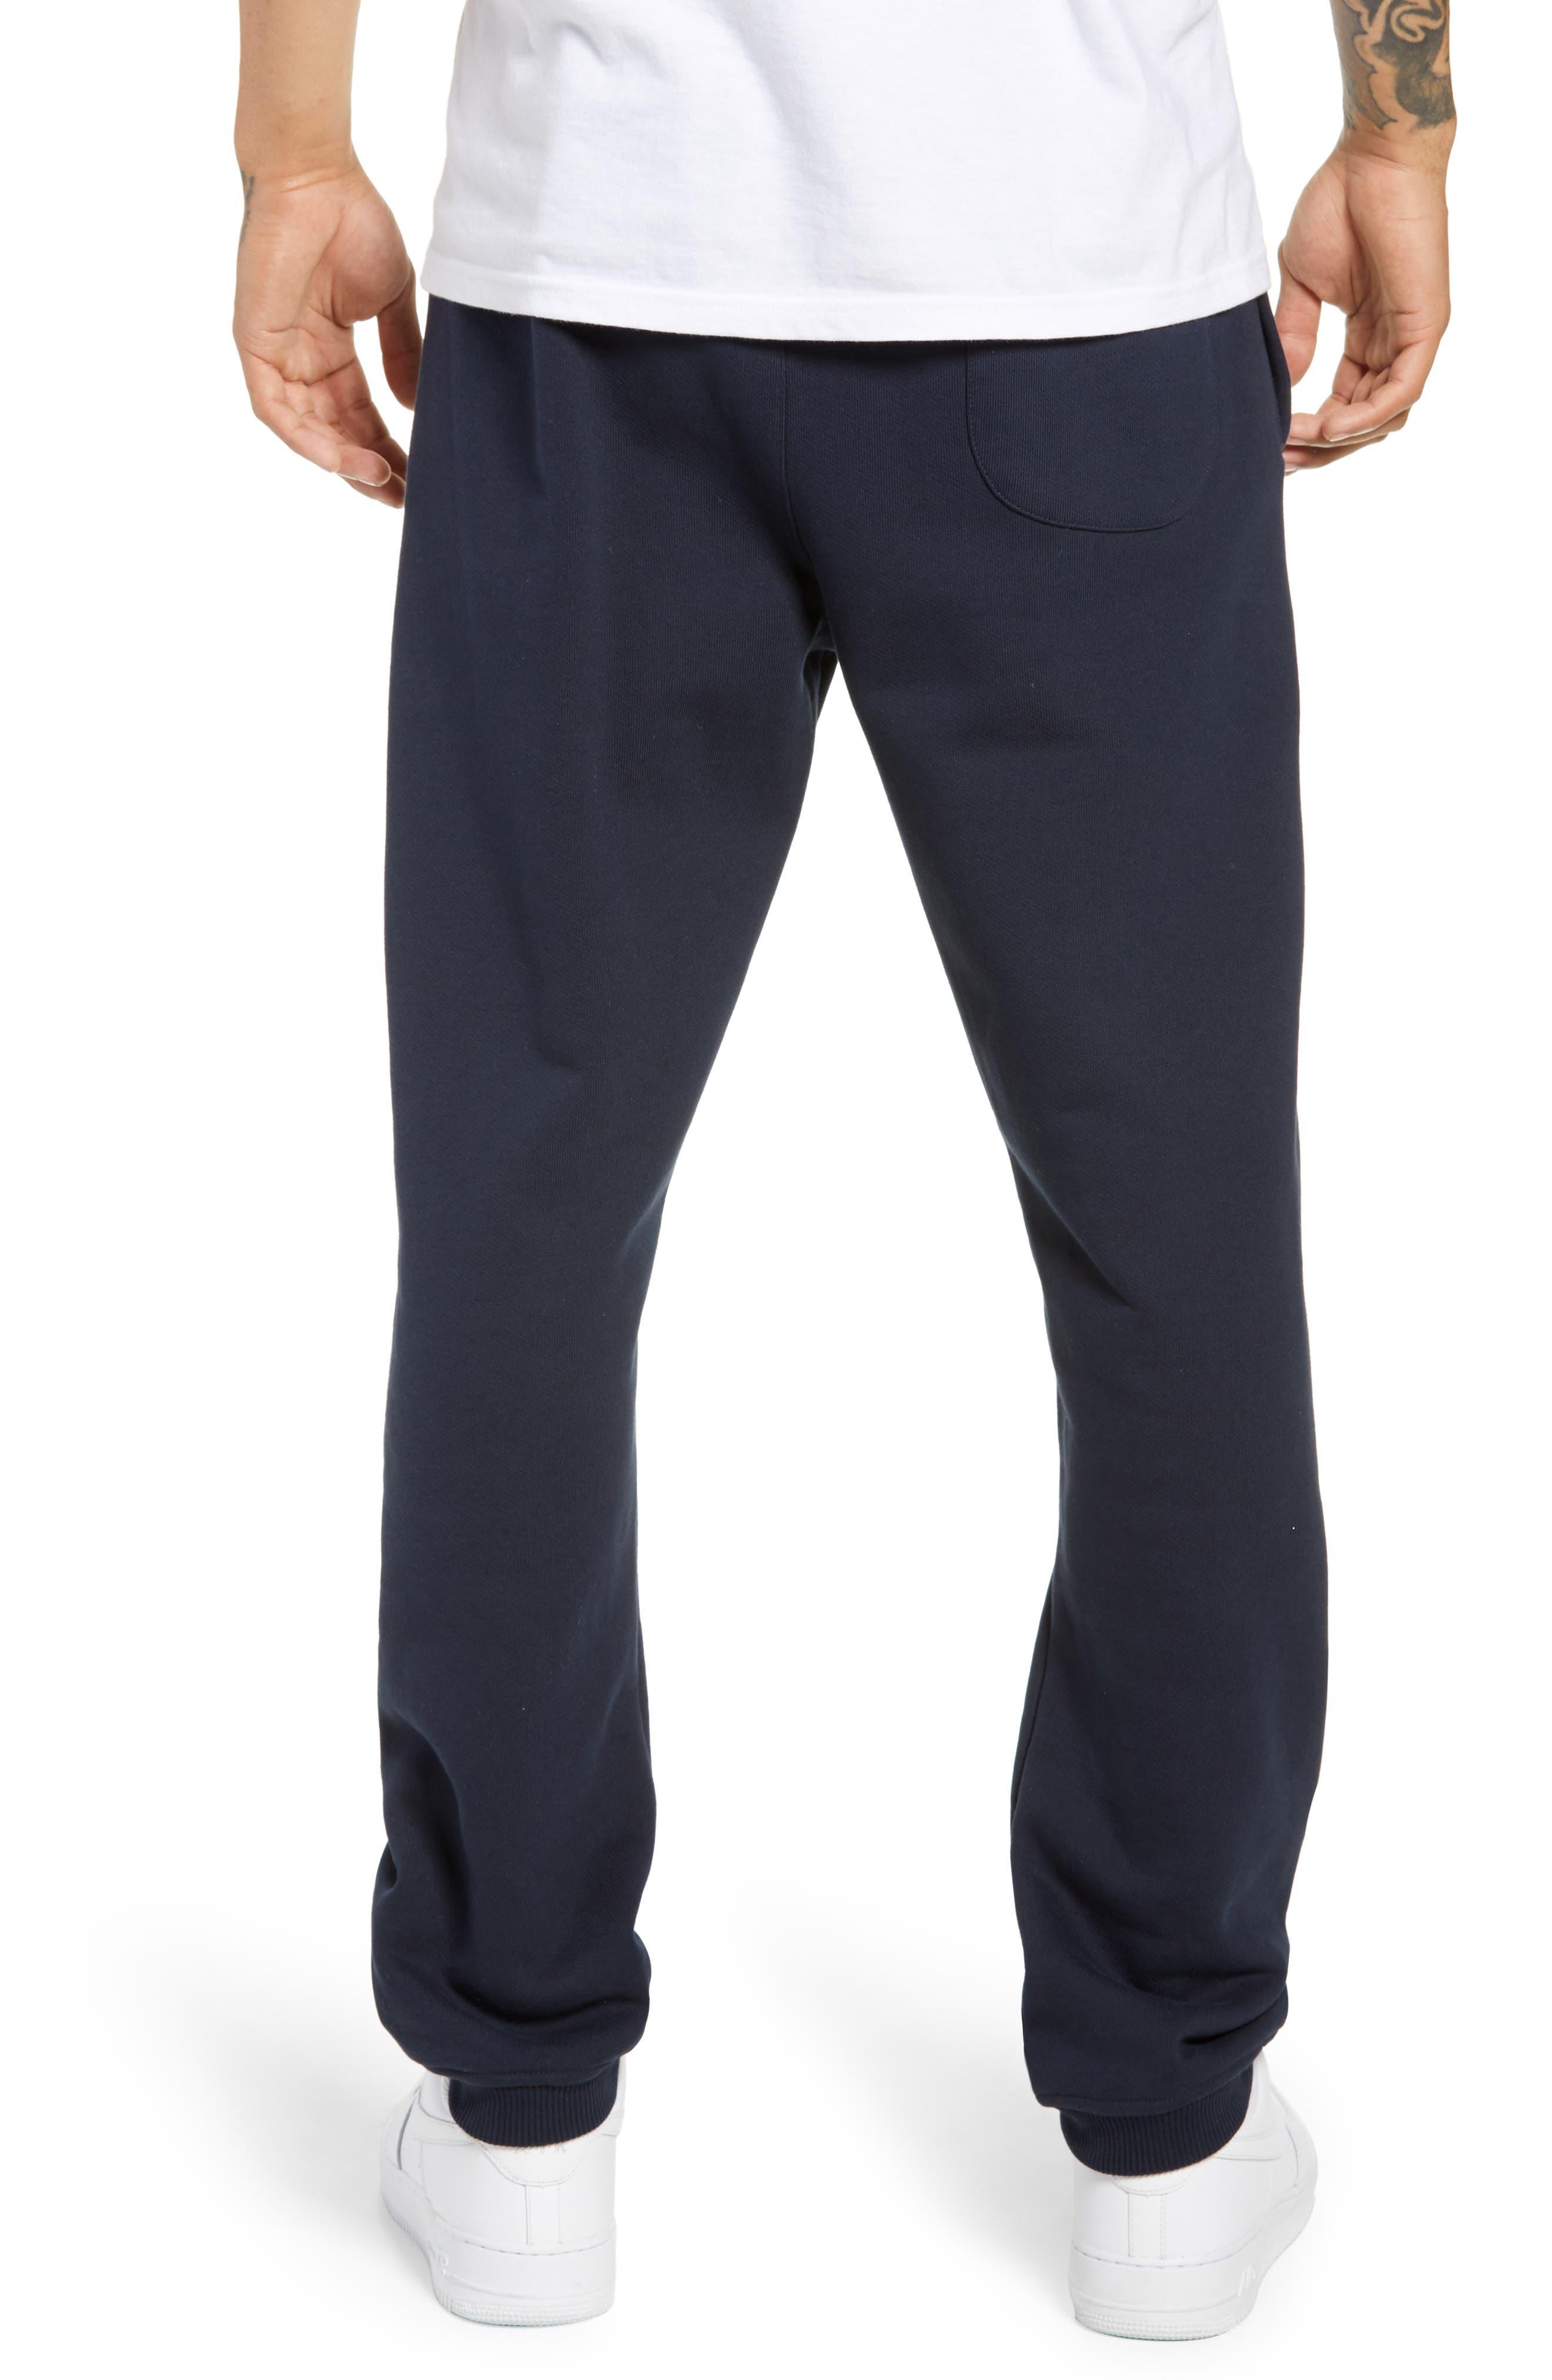 Embroidered Crest Sweatpants,                             Alternate thumbnail 2, color,                             DARK SAPPHIRE